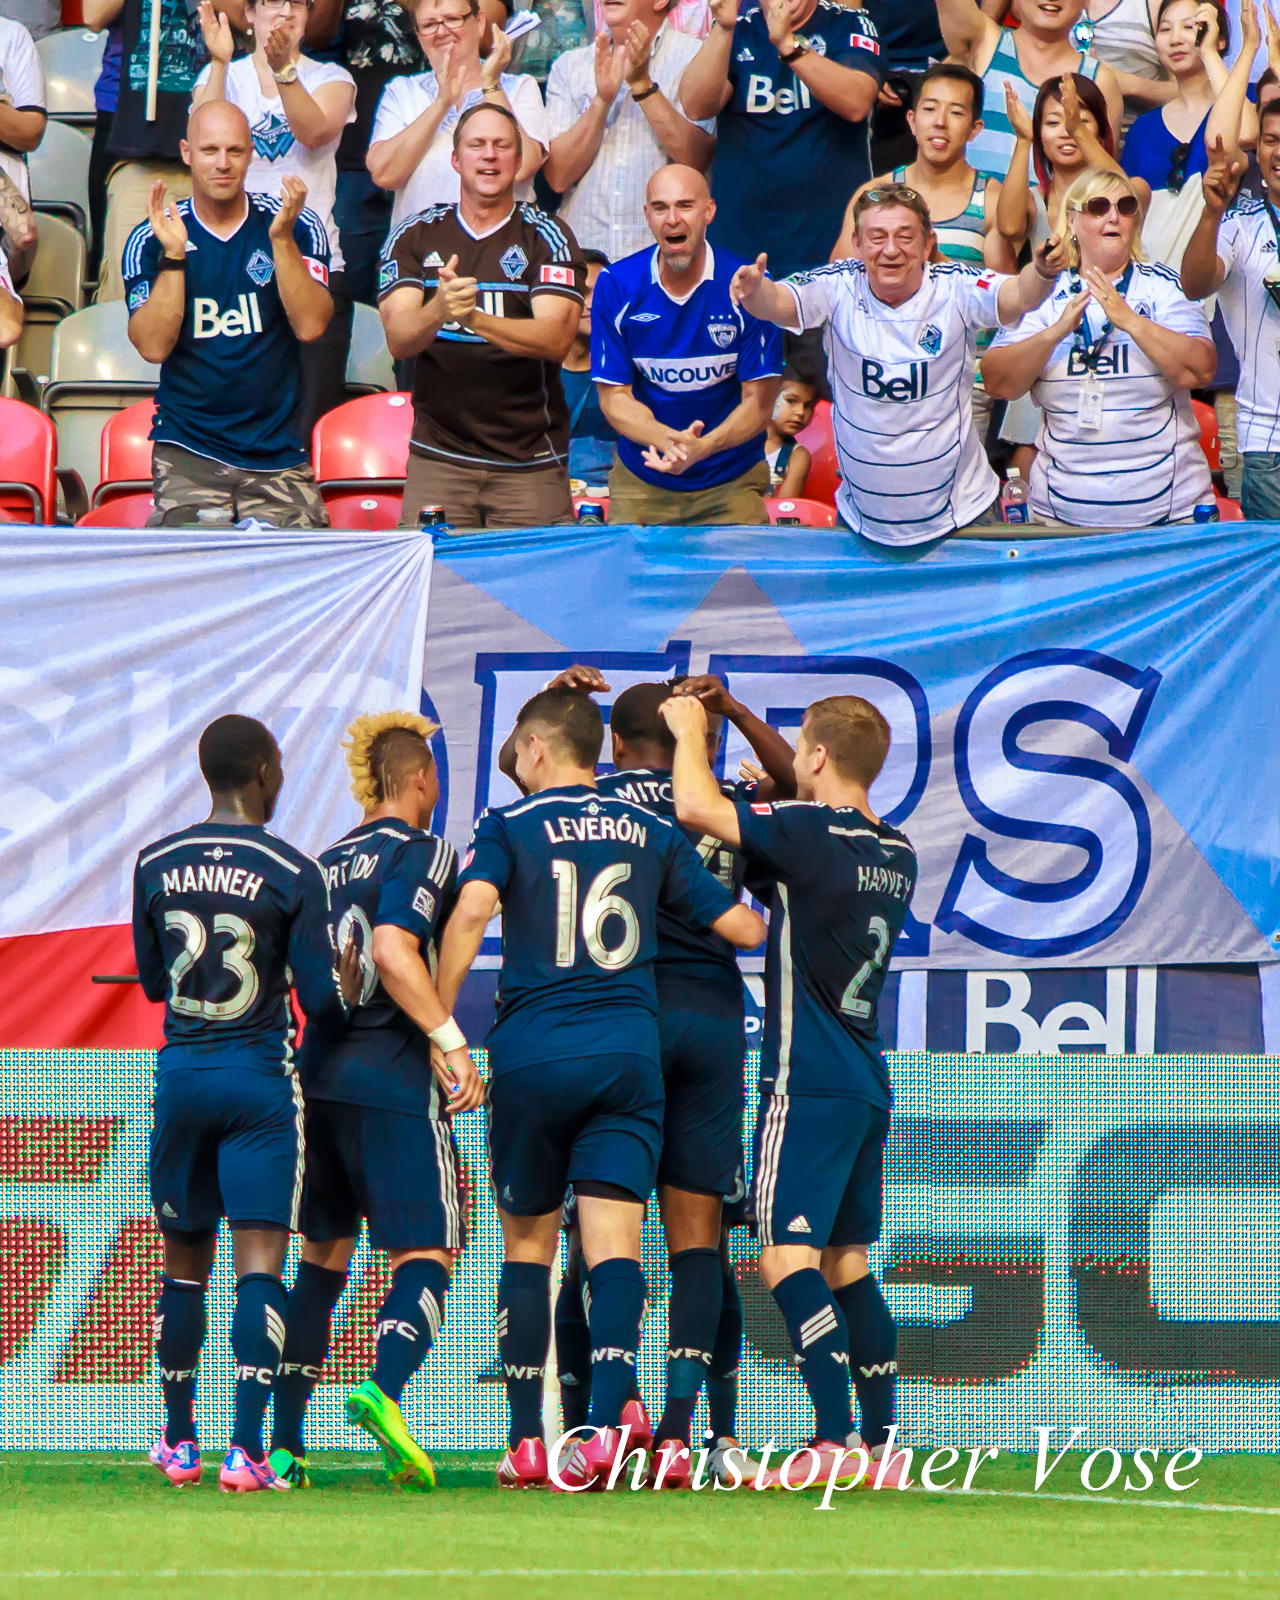 2014-07-12 Carlyle Mitchell Goal Celebration 2.jpg